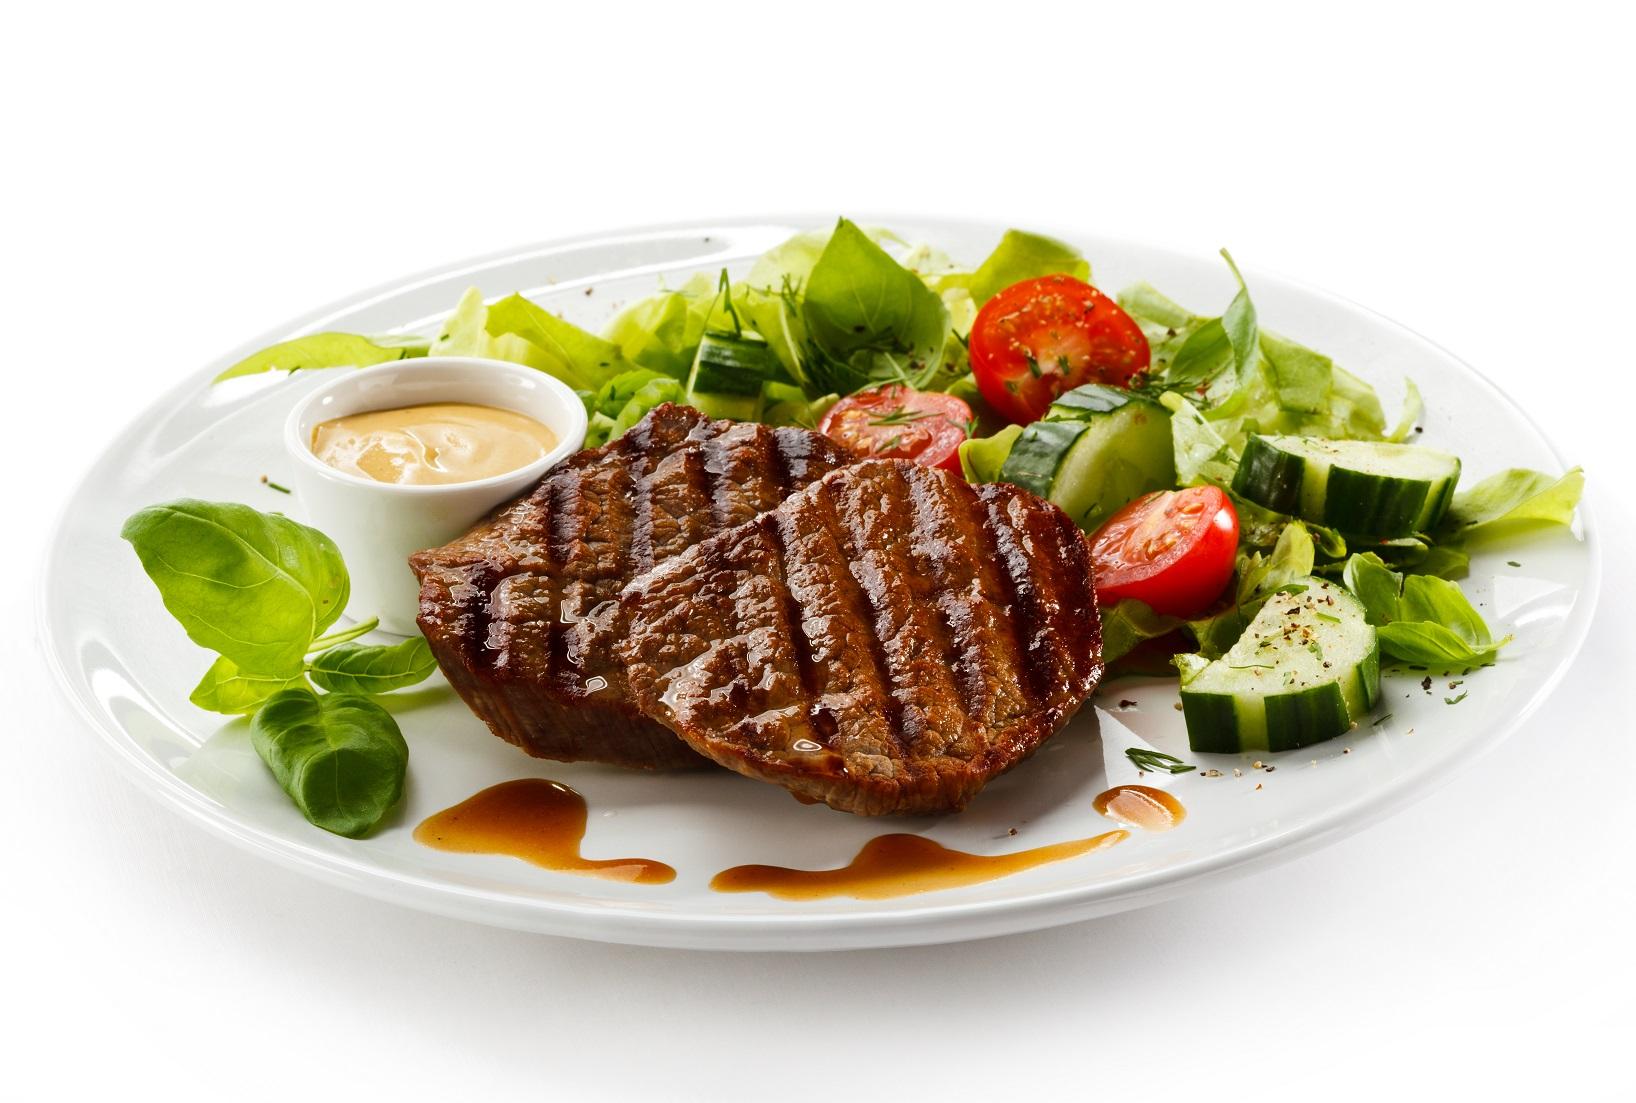 Este prato, acredite é vegano, e estará na feira